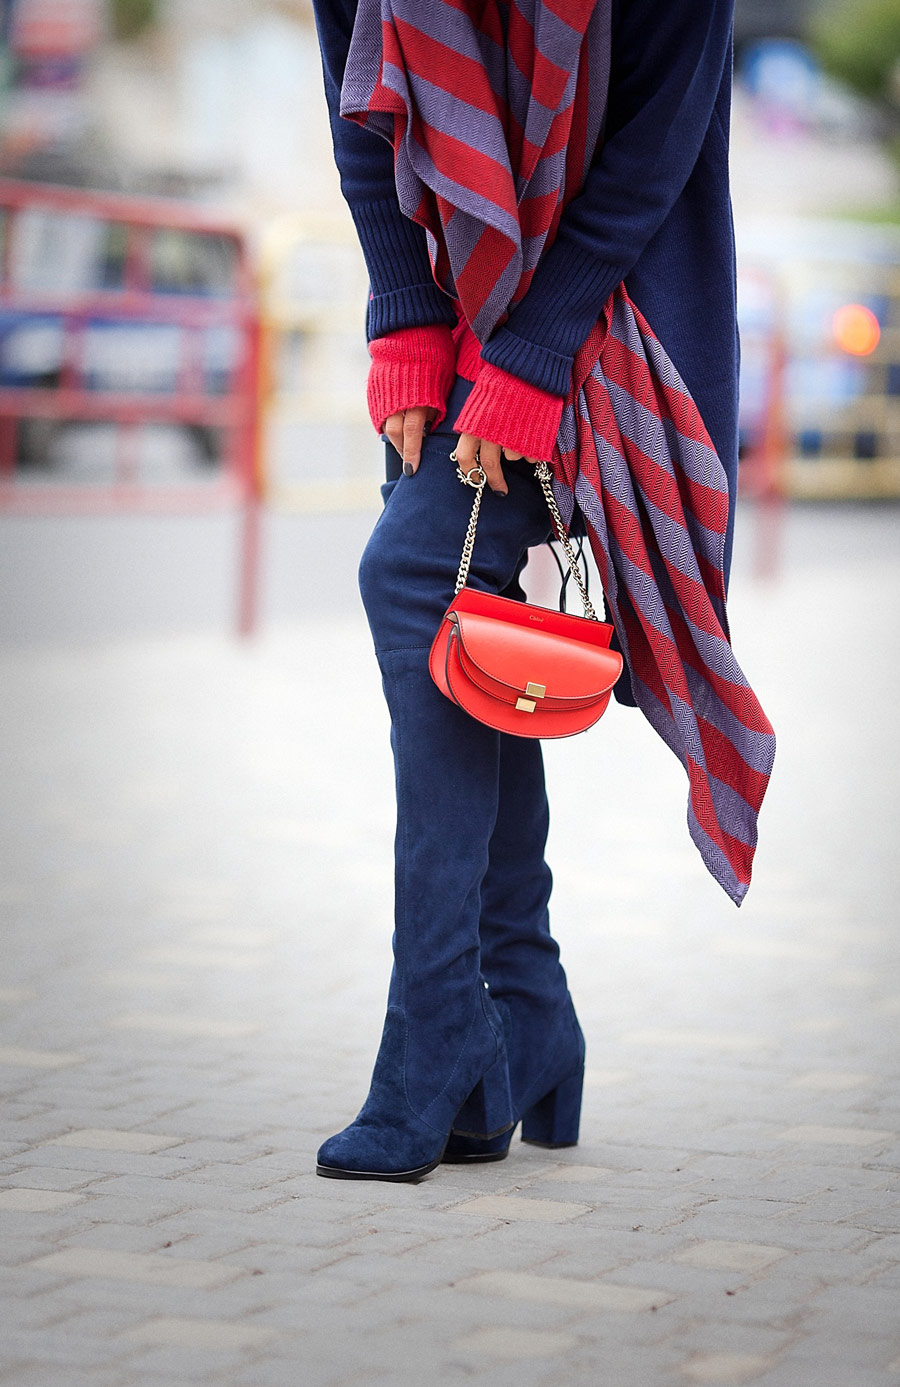 stuart weitzman over the knee boots, stuart weitzman boots photo, chloe georgia bag,